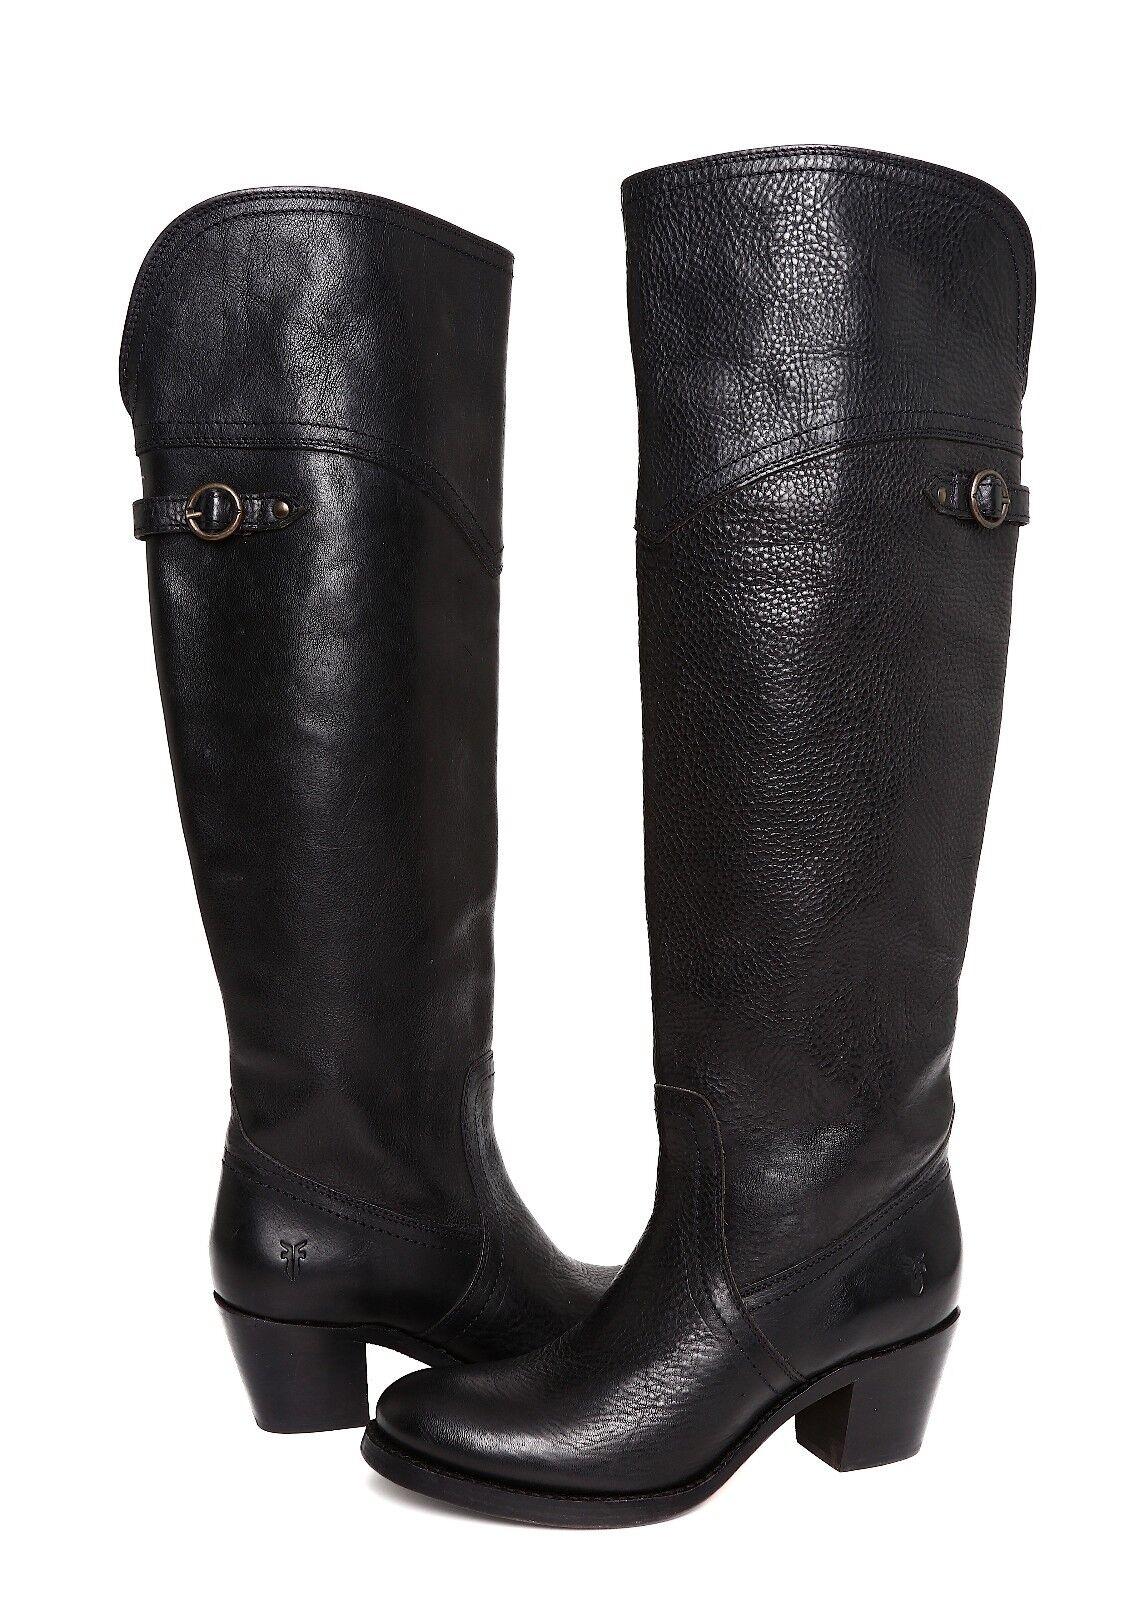 Frye Jane Women's Leather Tall Cuff Boot Sz 6.5B 4649